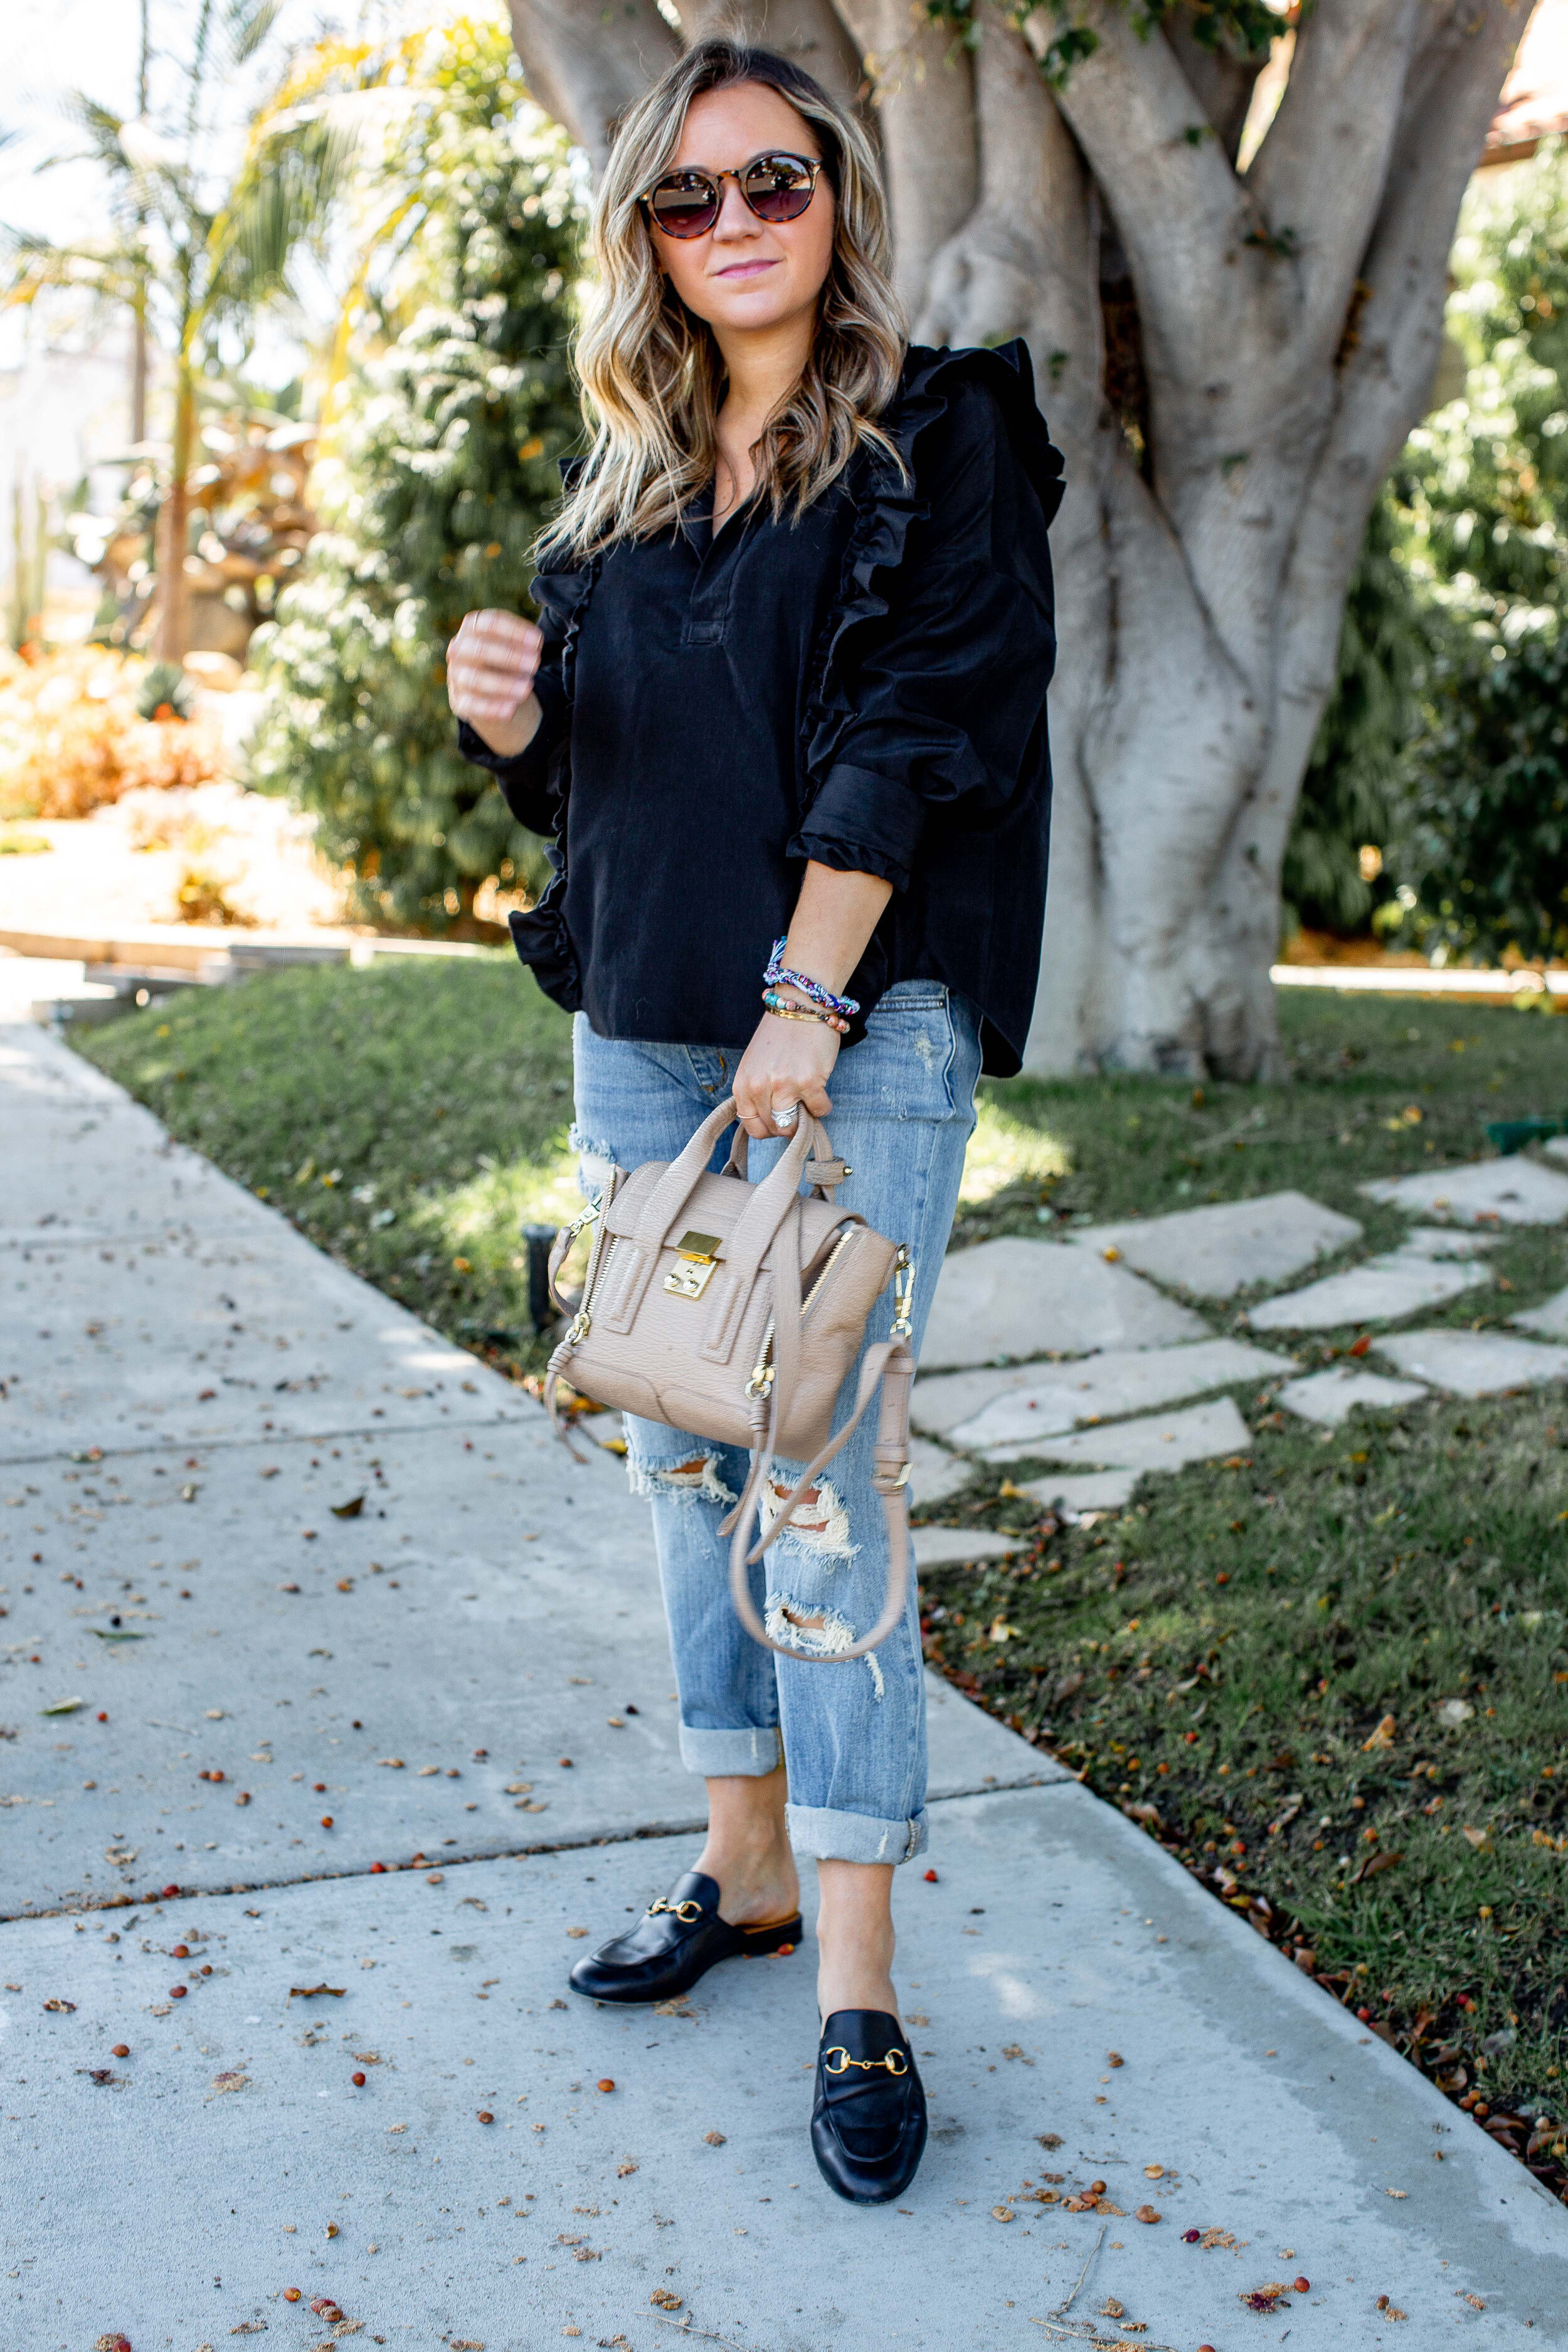 fizz-fade-bf-maternity-jeans-3.jpg